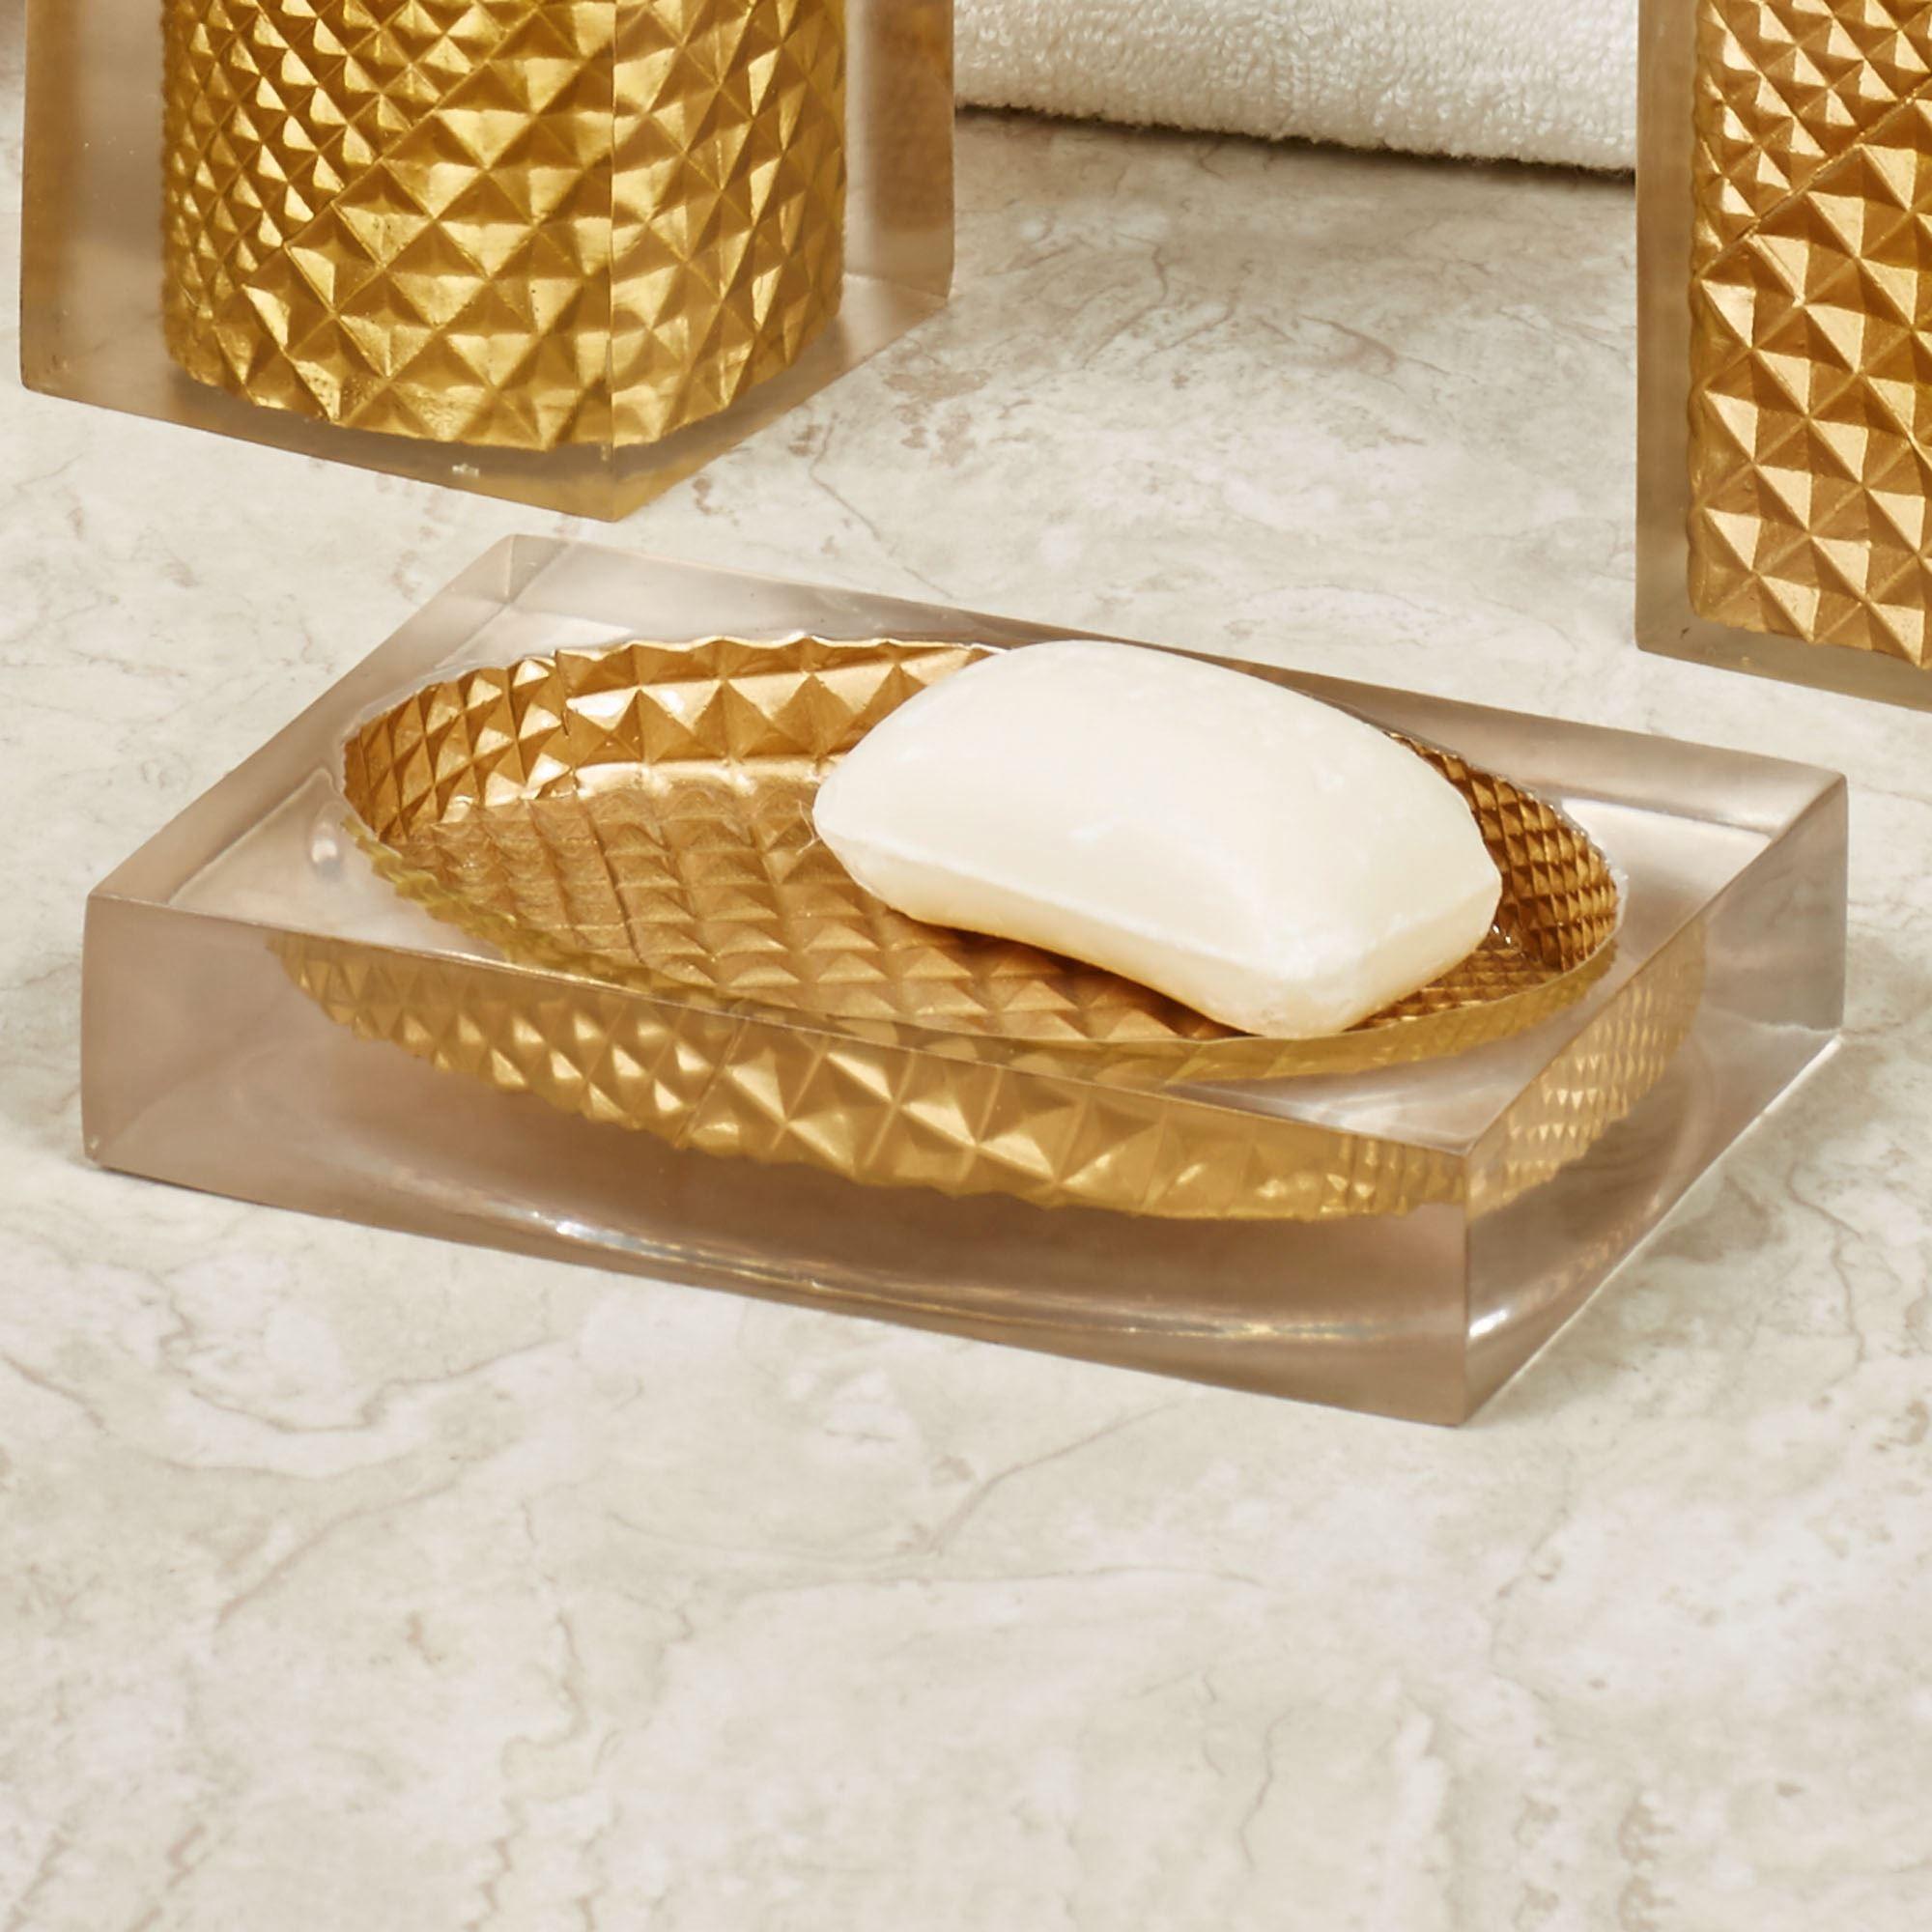 Diamond Elite Gold Bath Accents by Sherry Kline